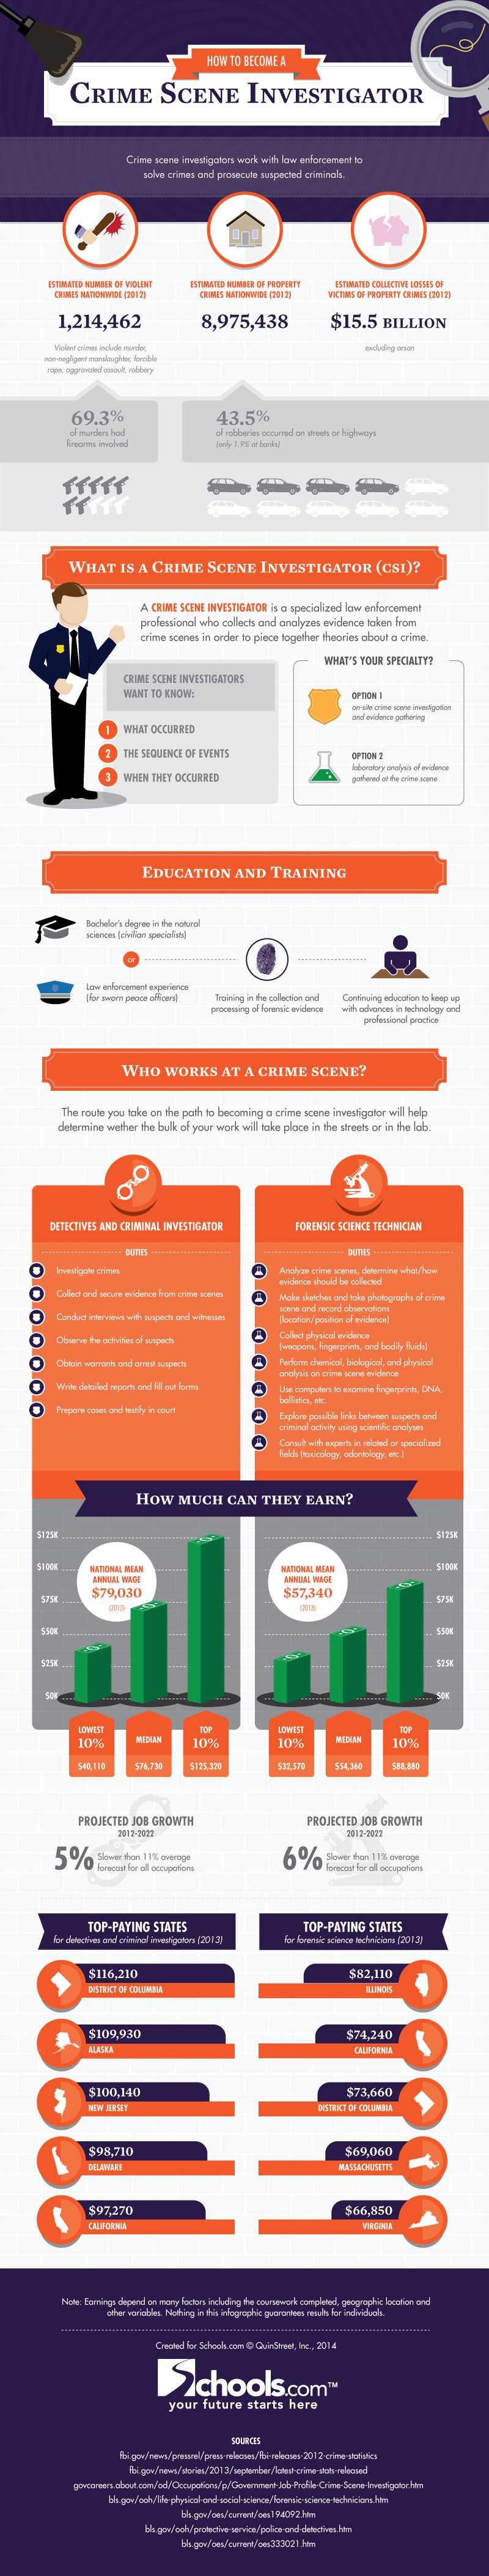 How to Become a Crime Scene Investigator(CSI) Professional - Infographic